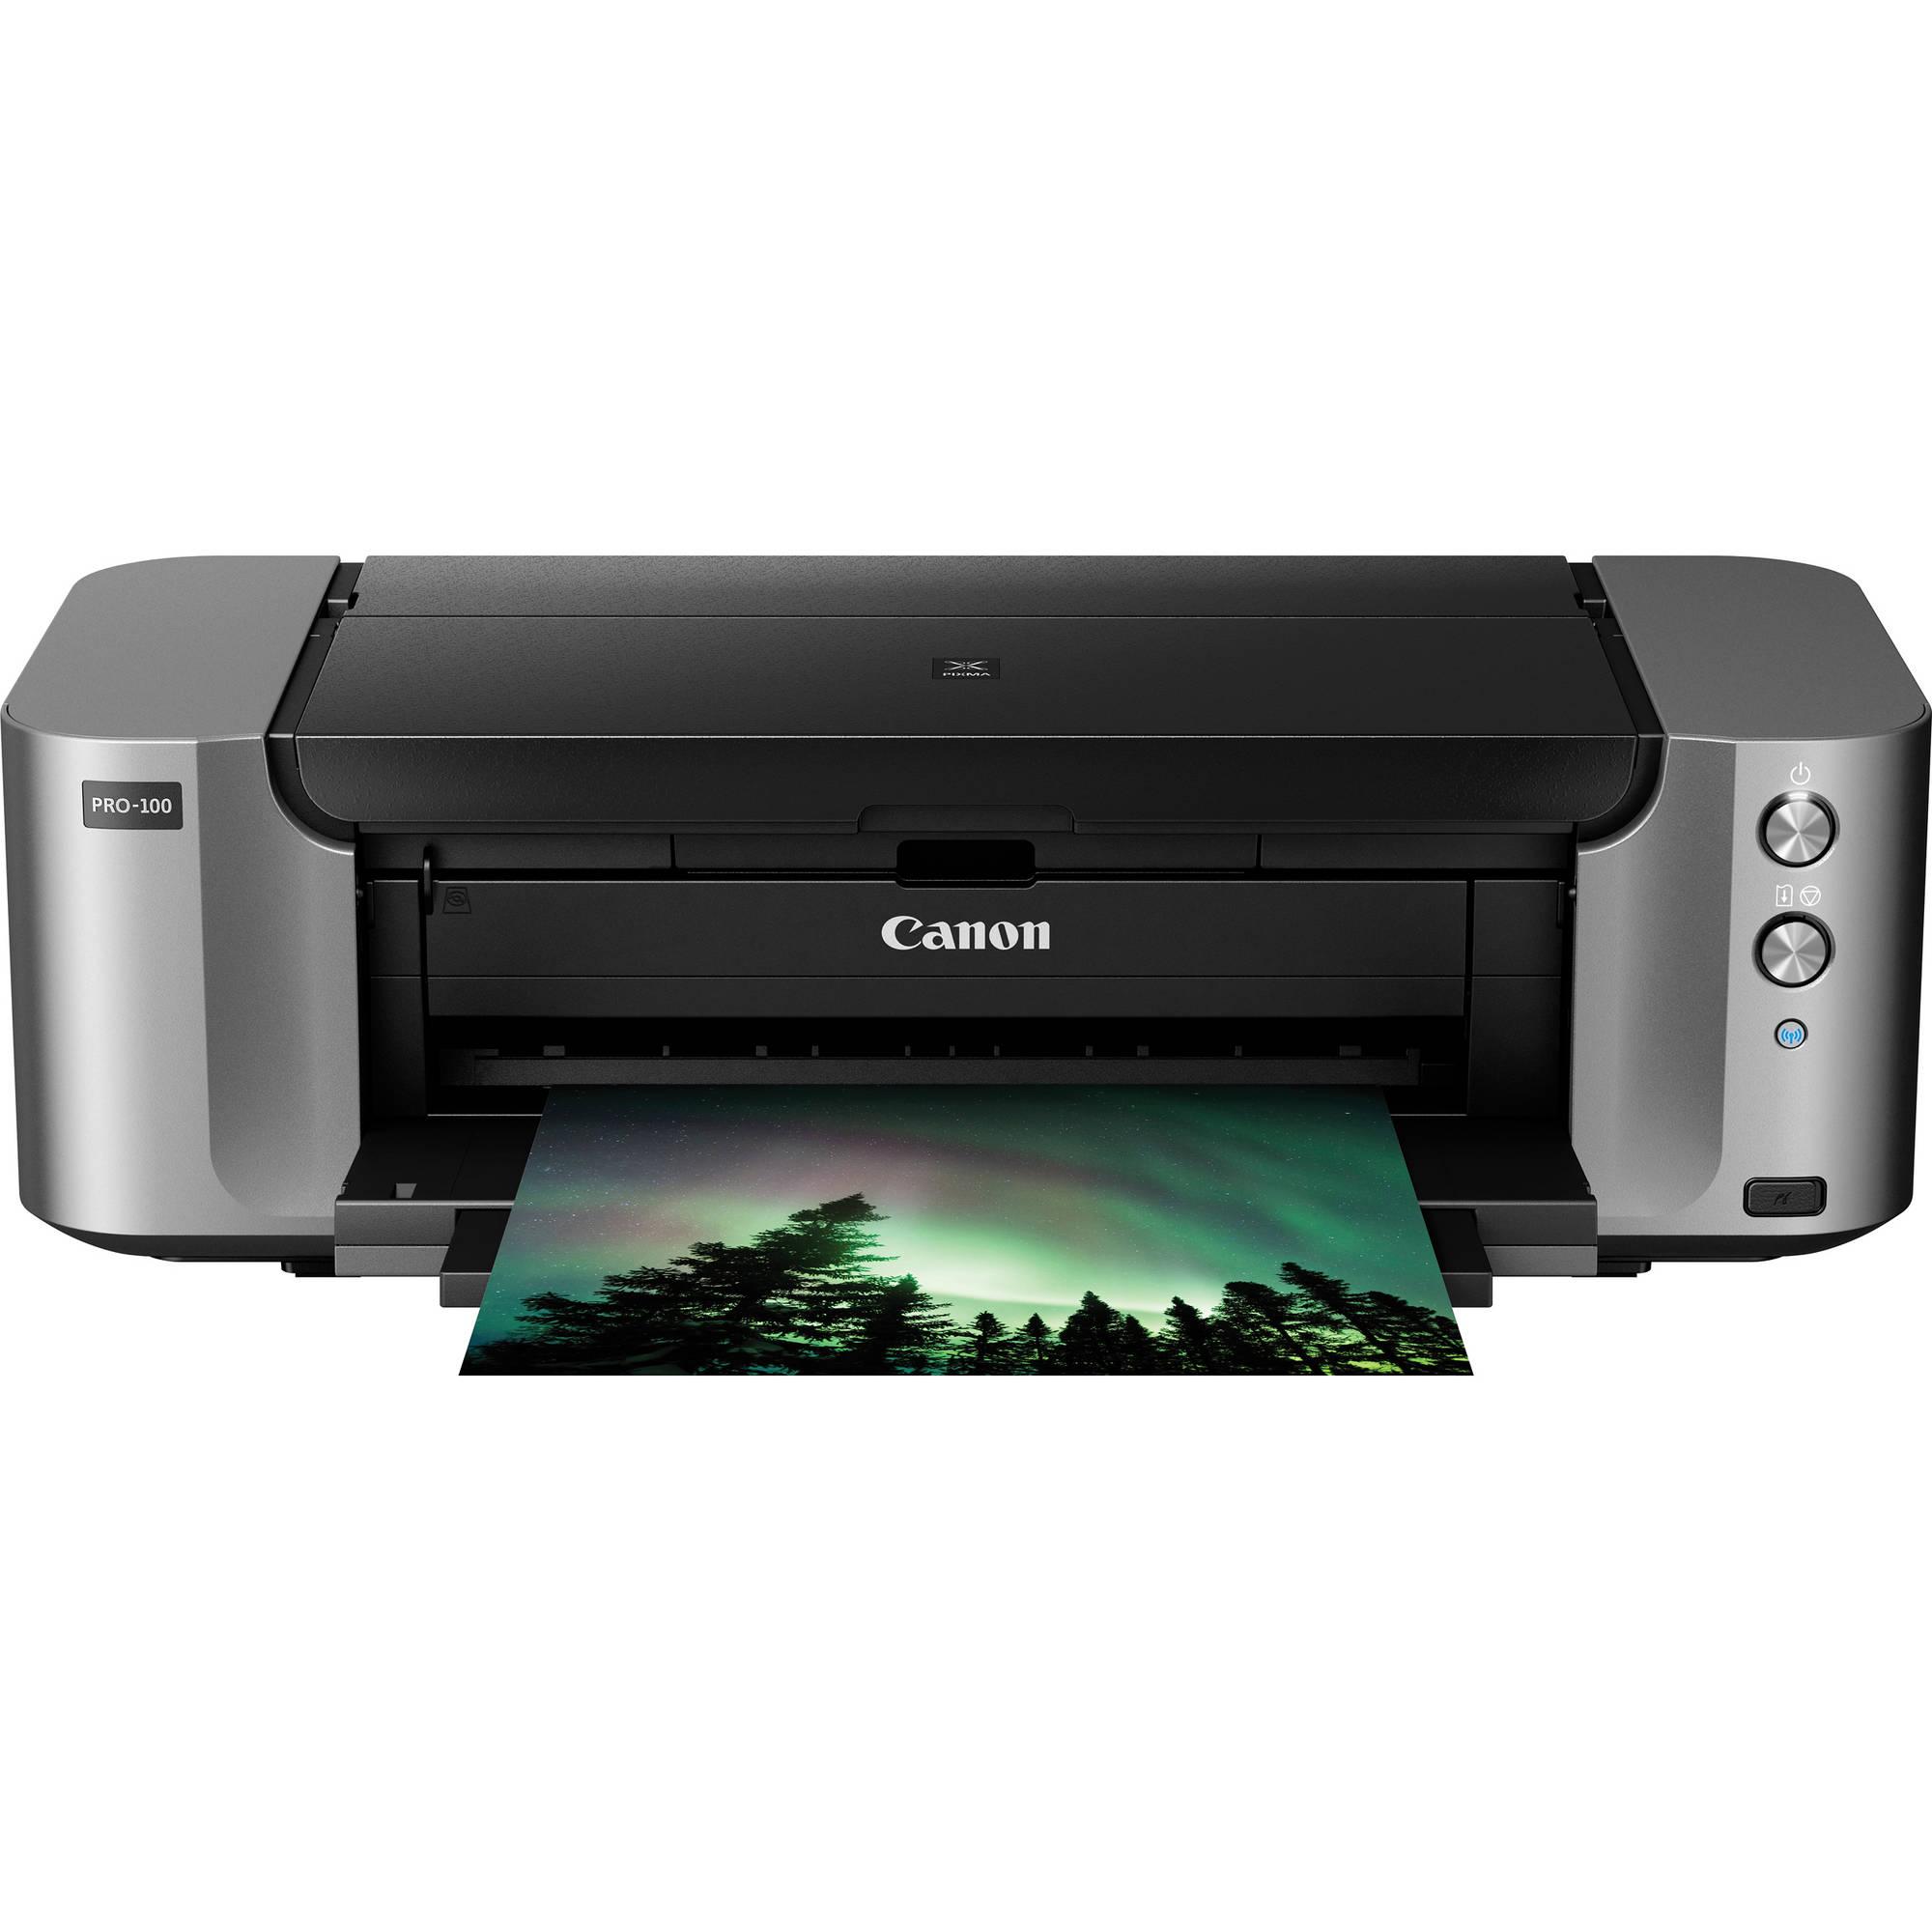 Canon PIXMA PRO-100 Wireless Professional Inkjet Photo Printer